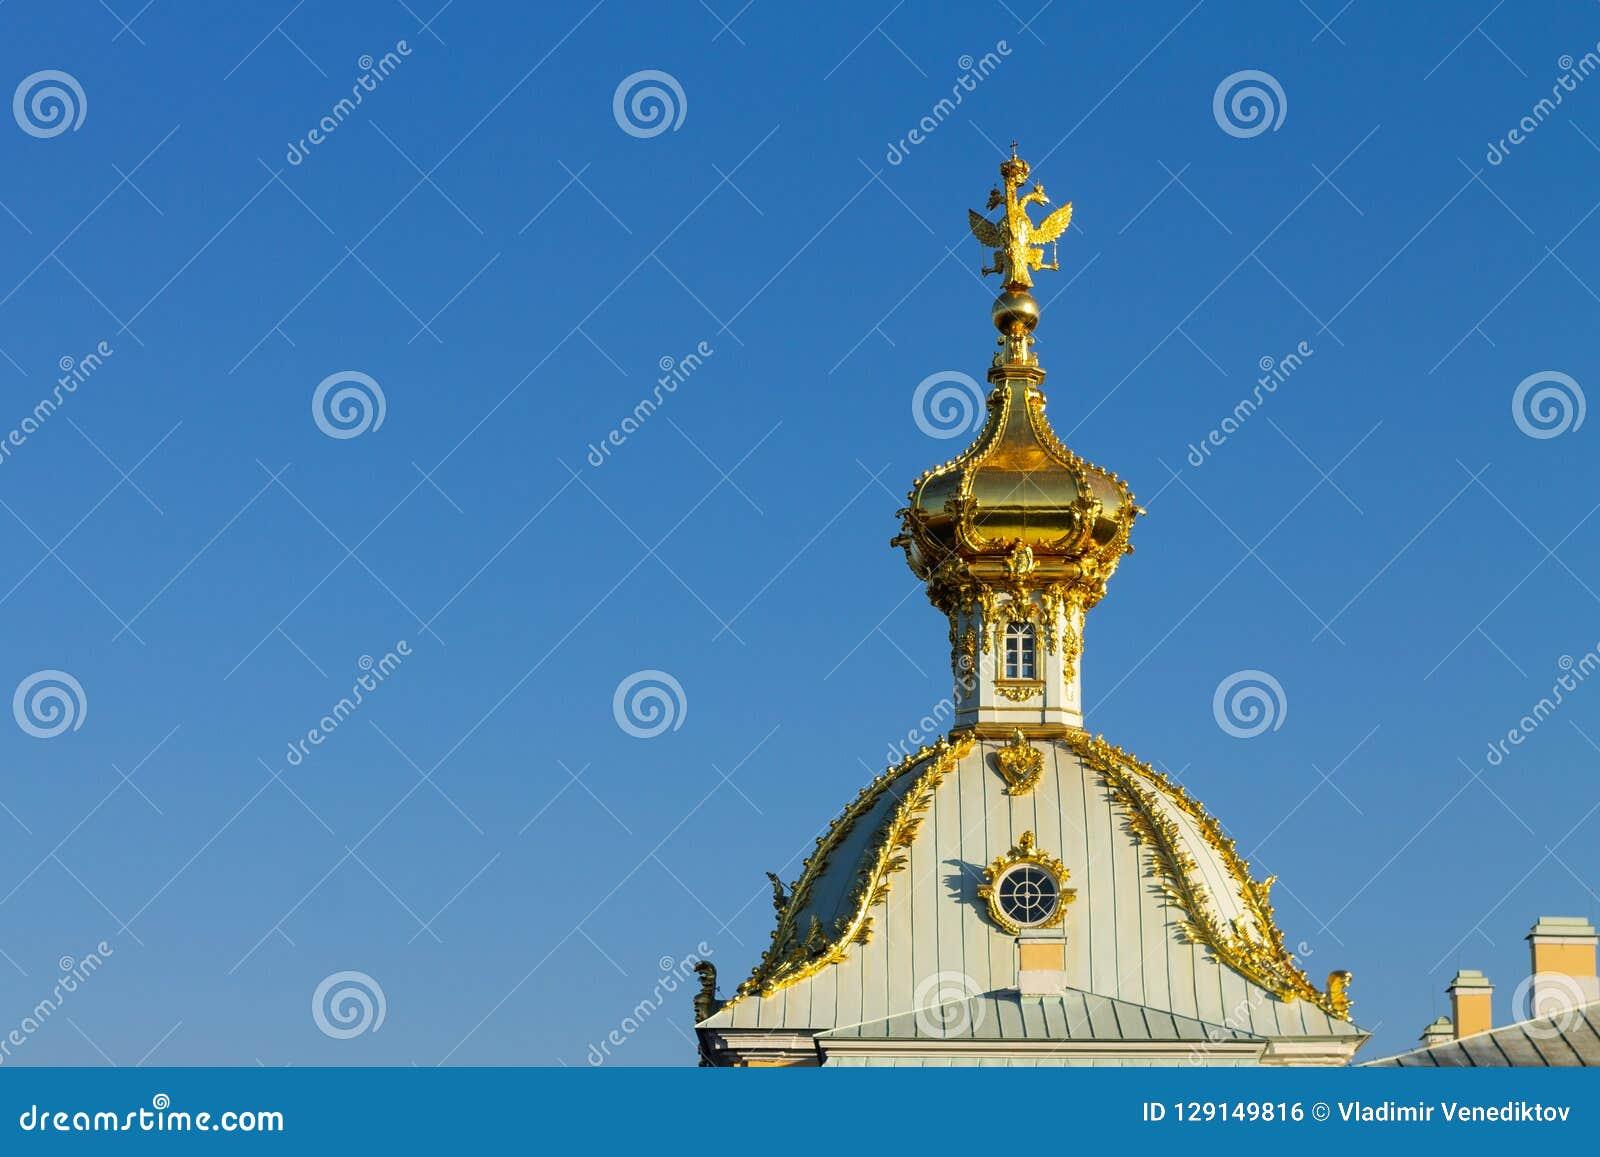 Gold domes cupolas againts blue sky